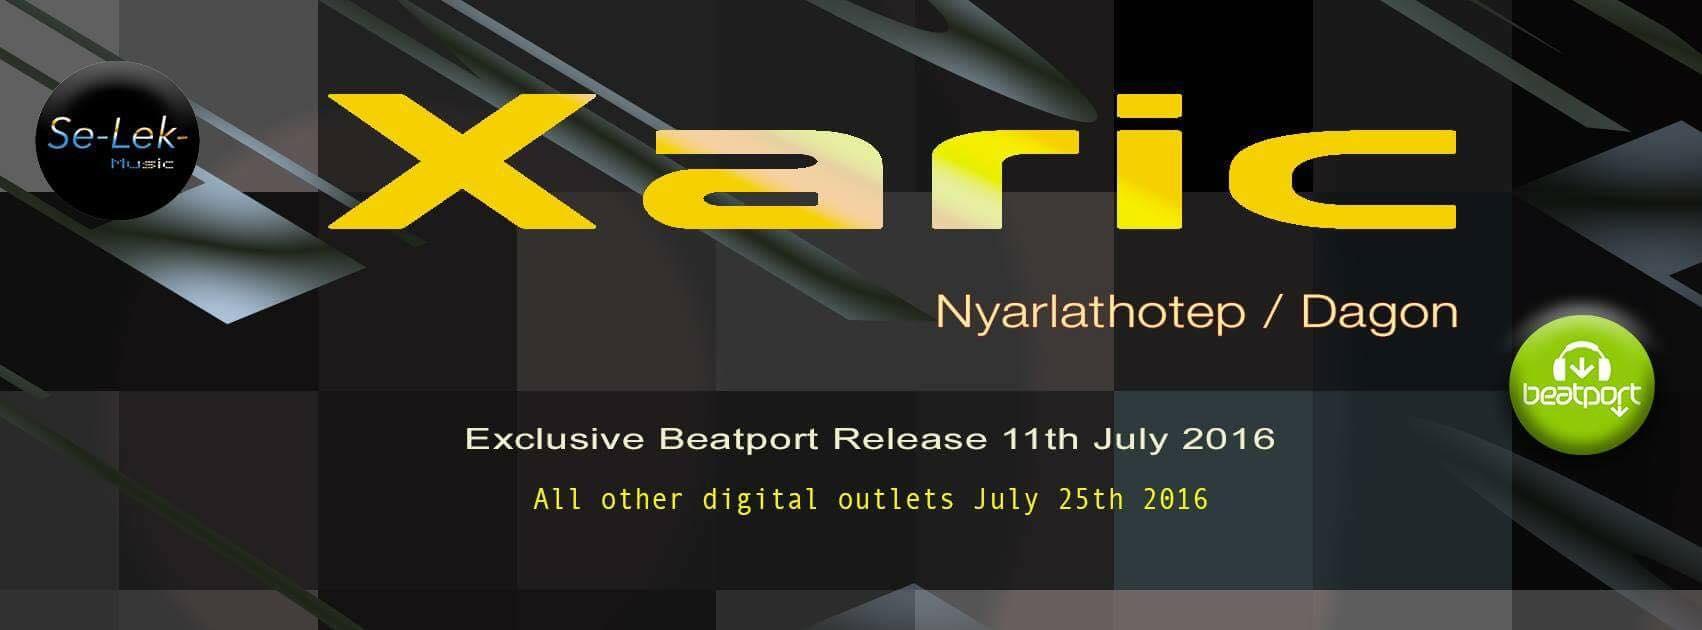 Xaric – Nyarlathotep / Dagon [Se-Lek Music]